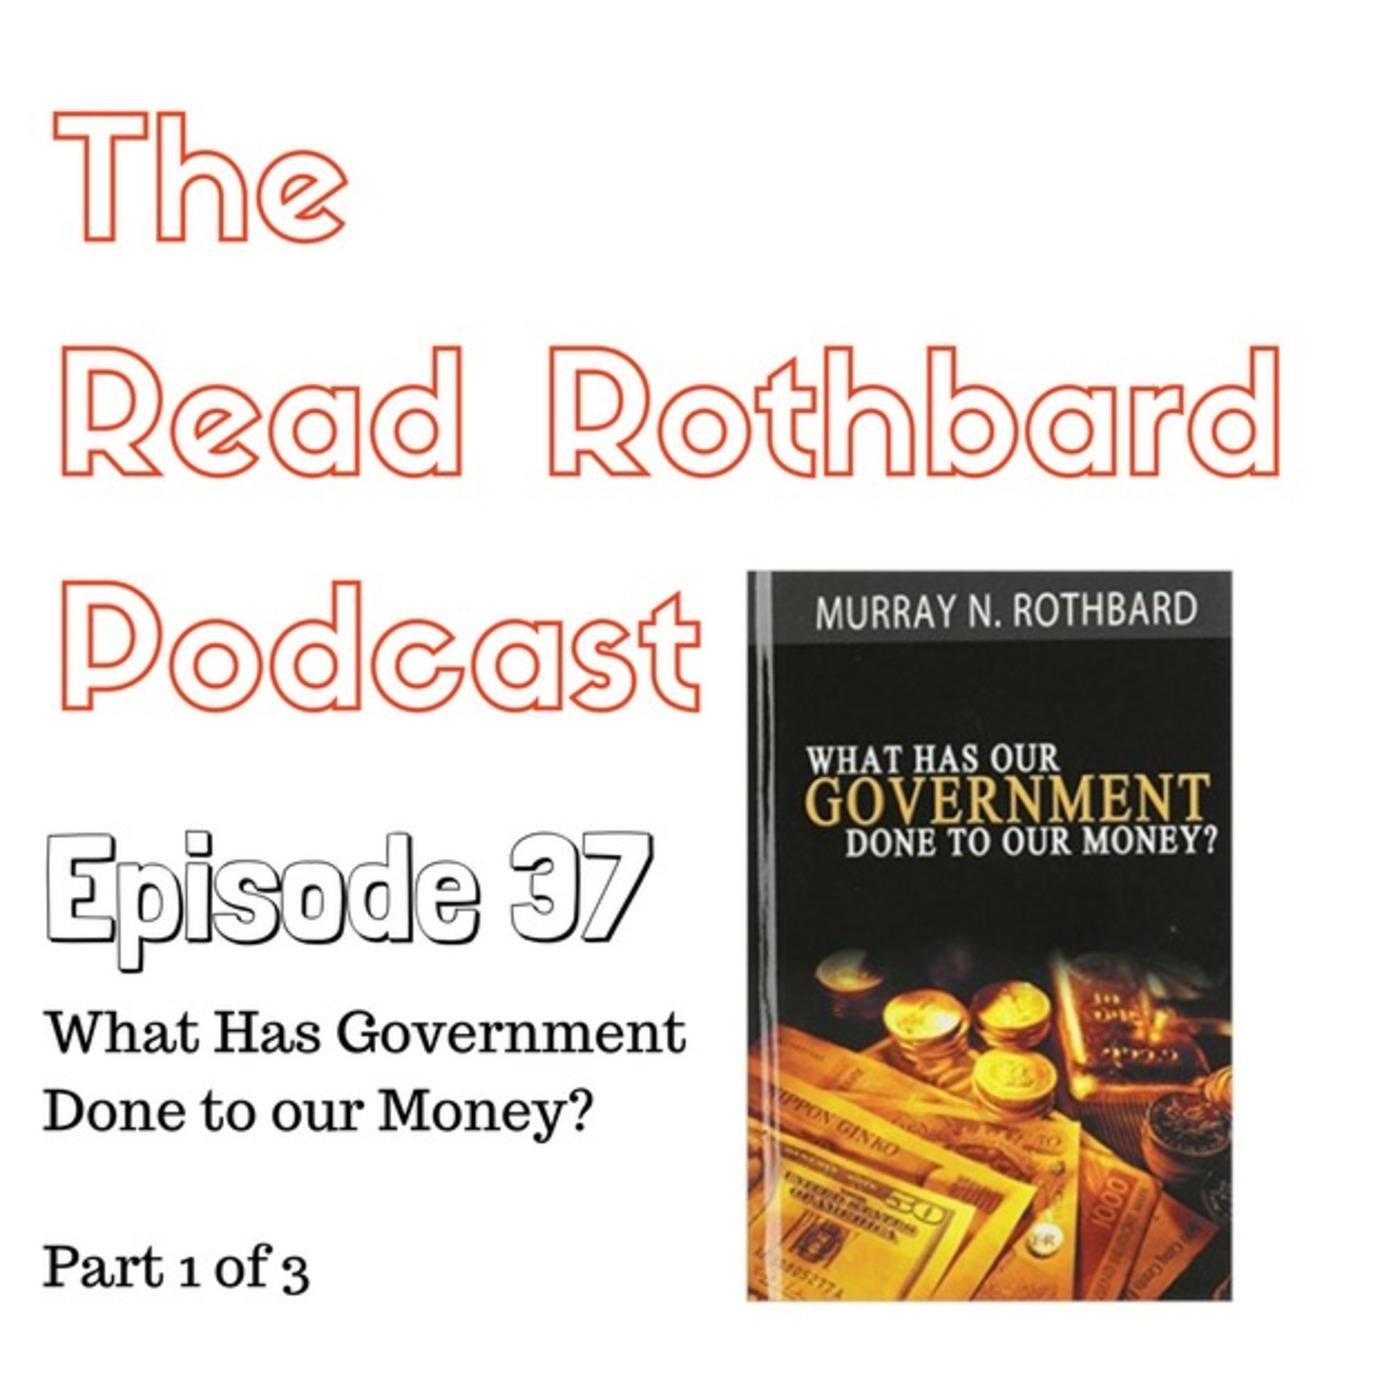 Rothbard anatomy of the state